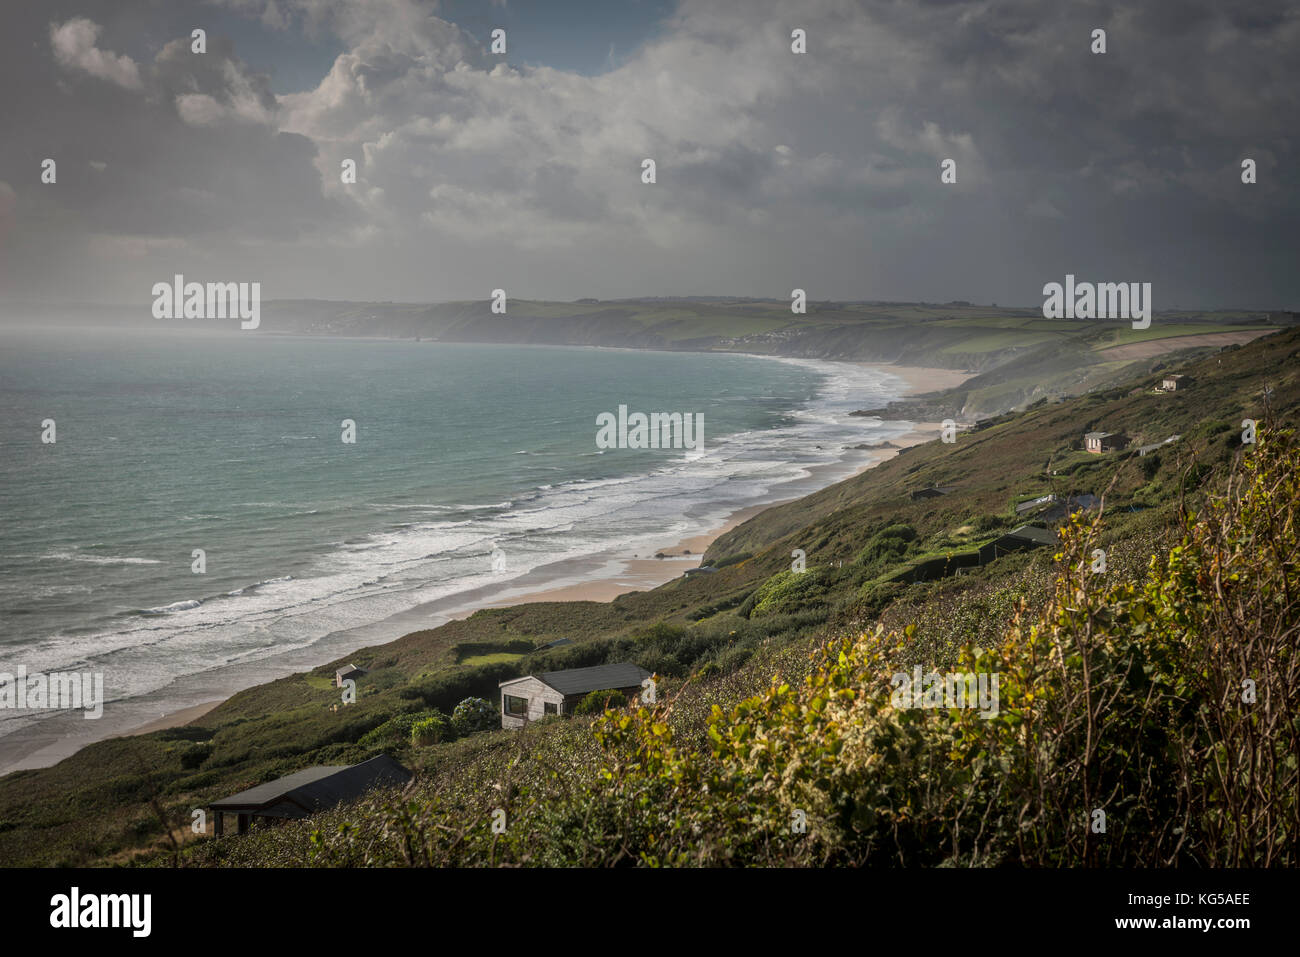 Whitsand Bay, Cornwall, UK - Stock Image